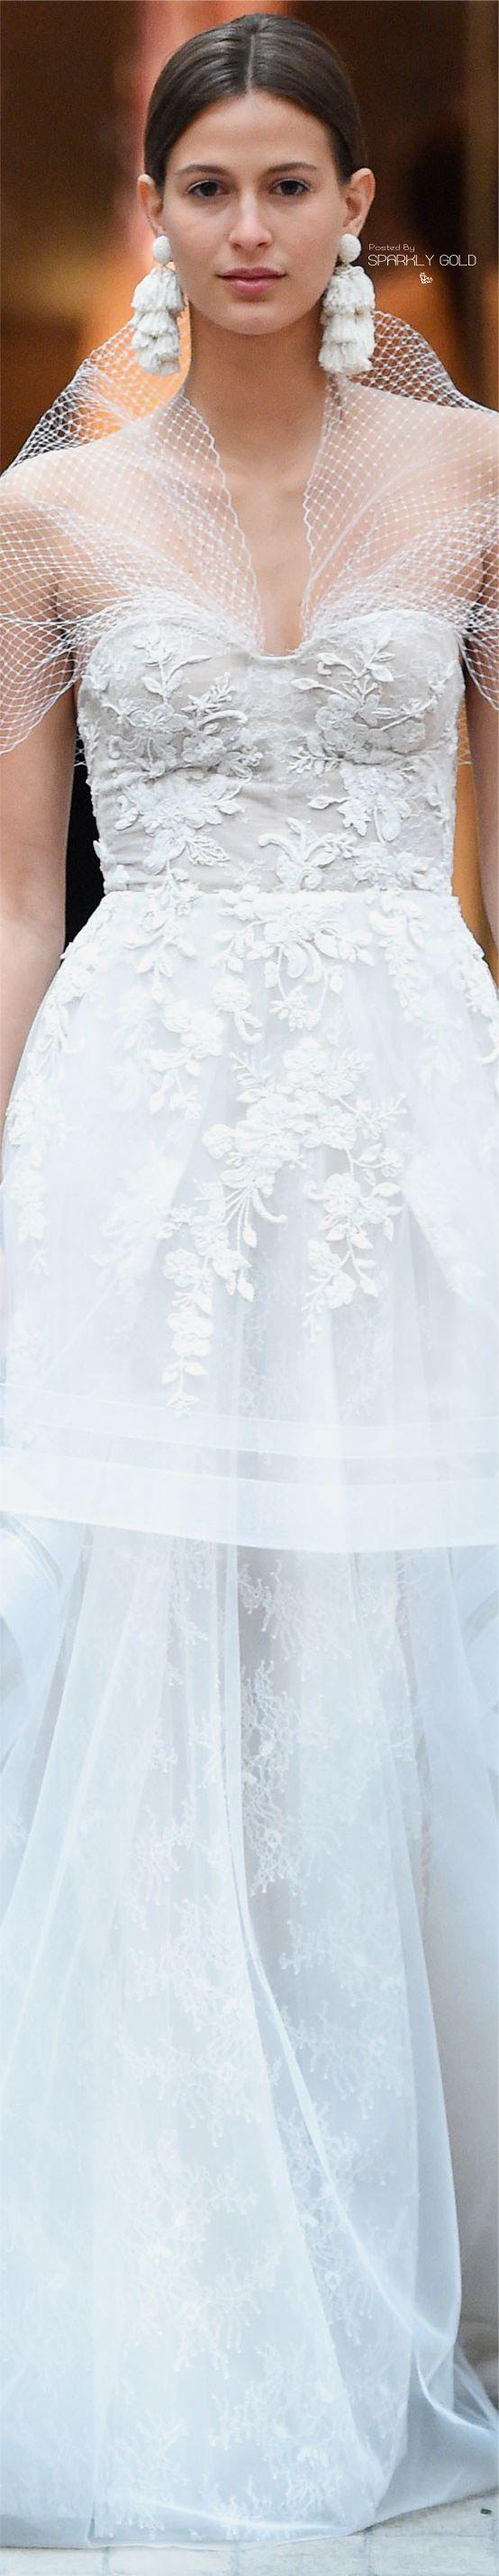 Elegant  best Wedding Gowns u Dresses images on Pinterest Marriage Wedding dressses and Brides